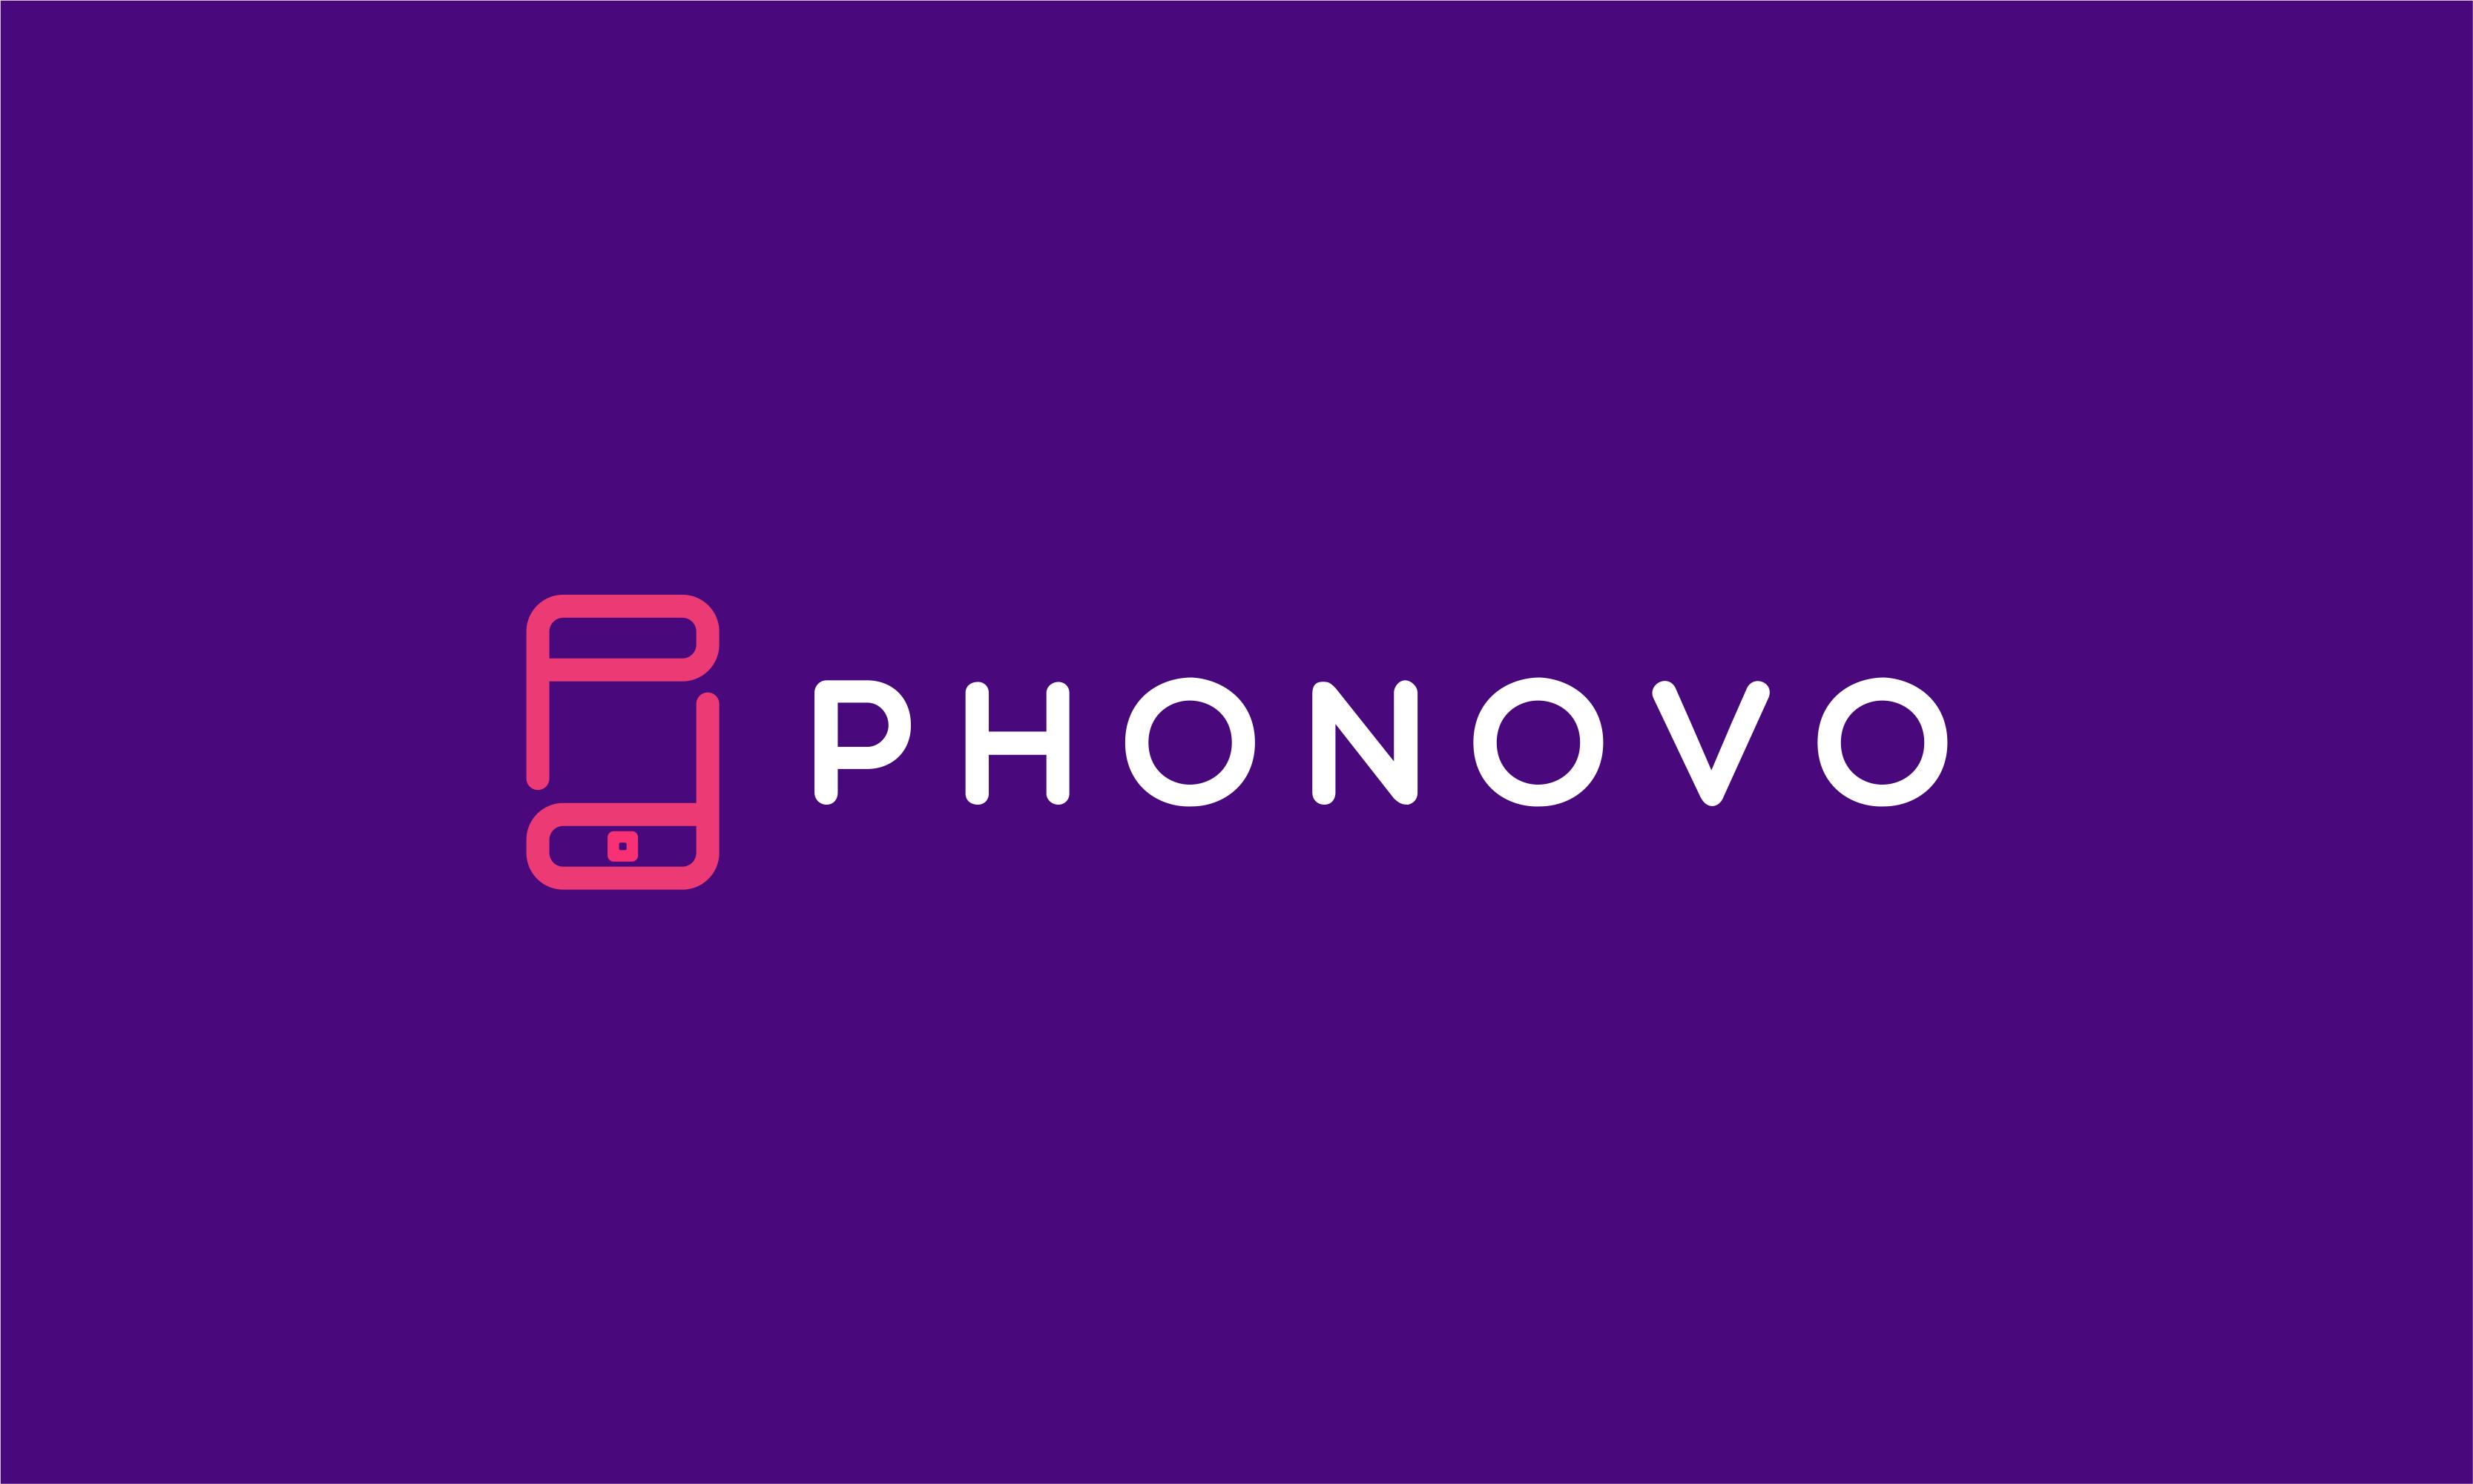 Phonovo